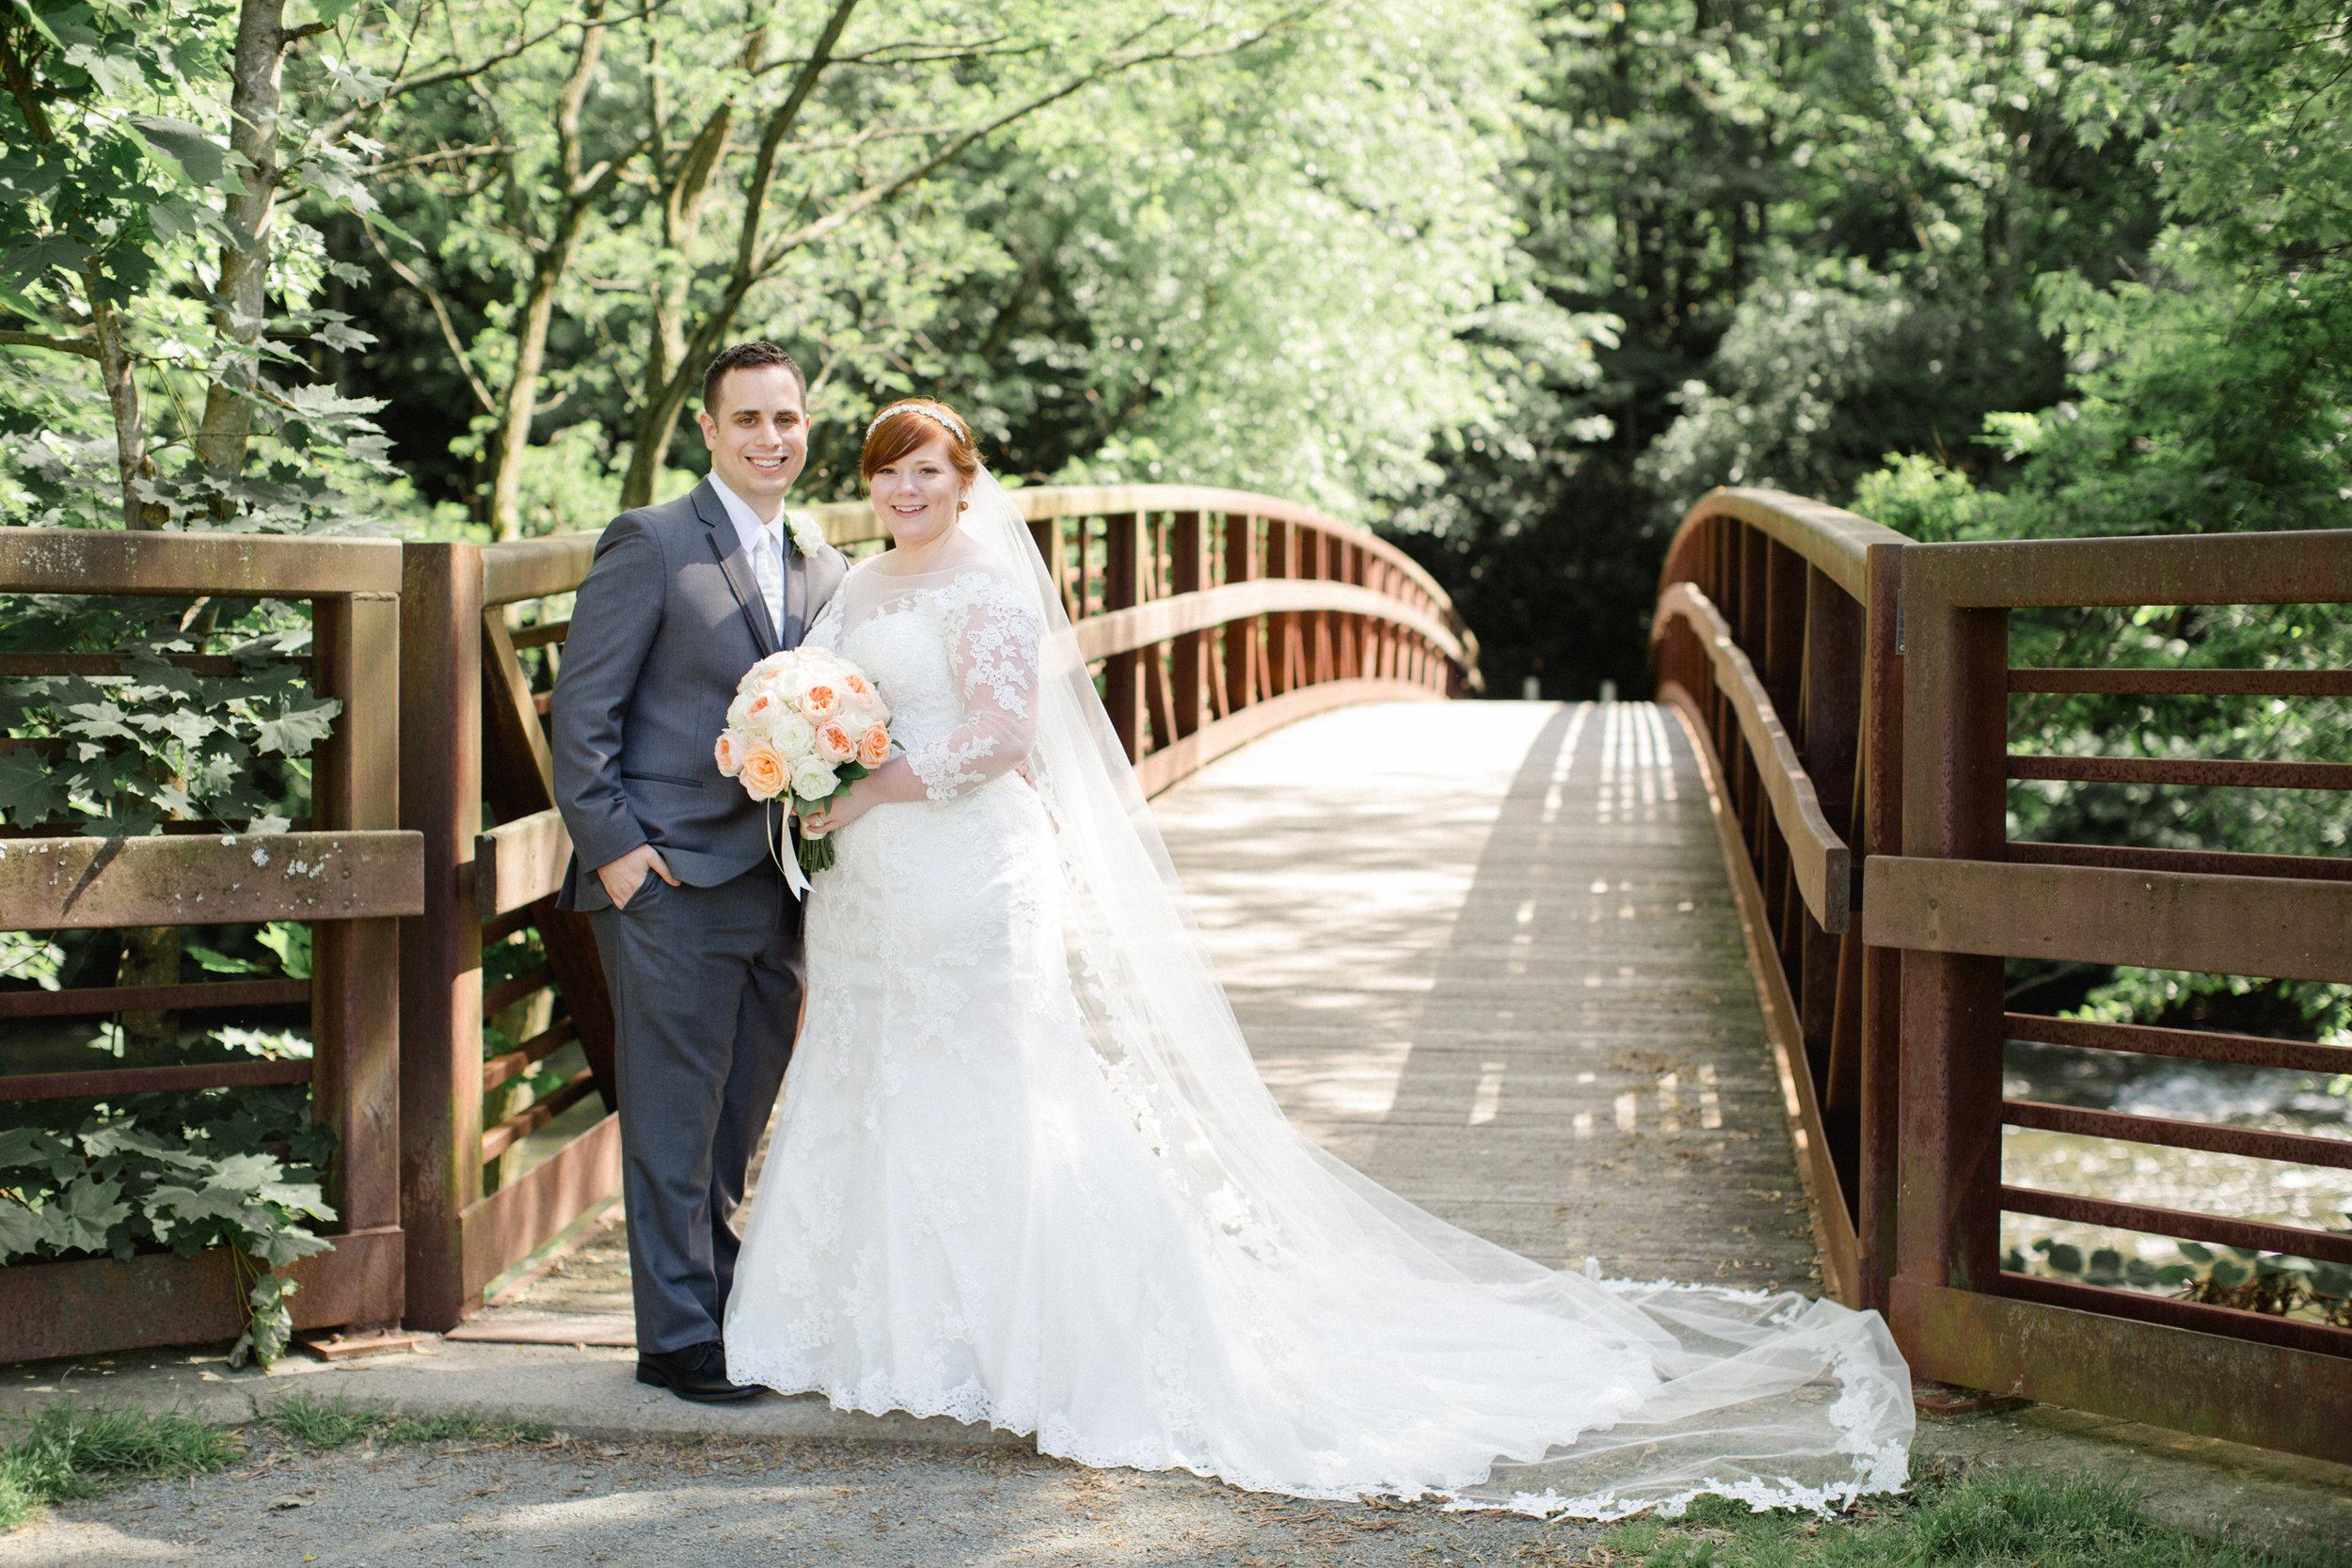 Fiorellis Wedding Photos_JDP-95.jpg